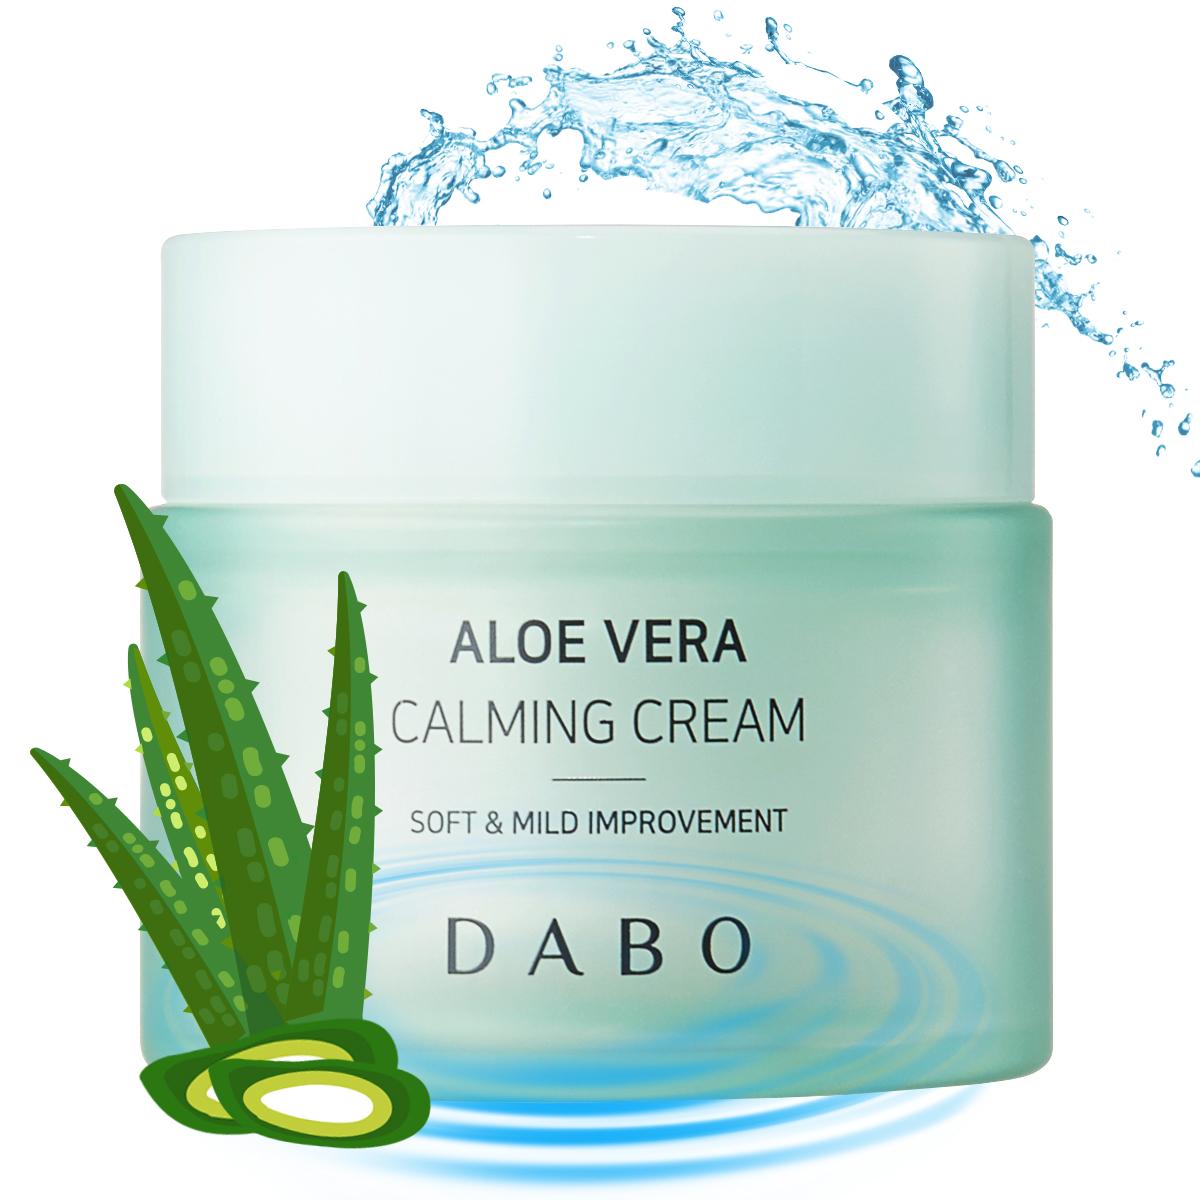 Kem dưỡng da Lô Hội cao cấp - Dabo Aloe Vera Calming Cream 50ml